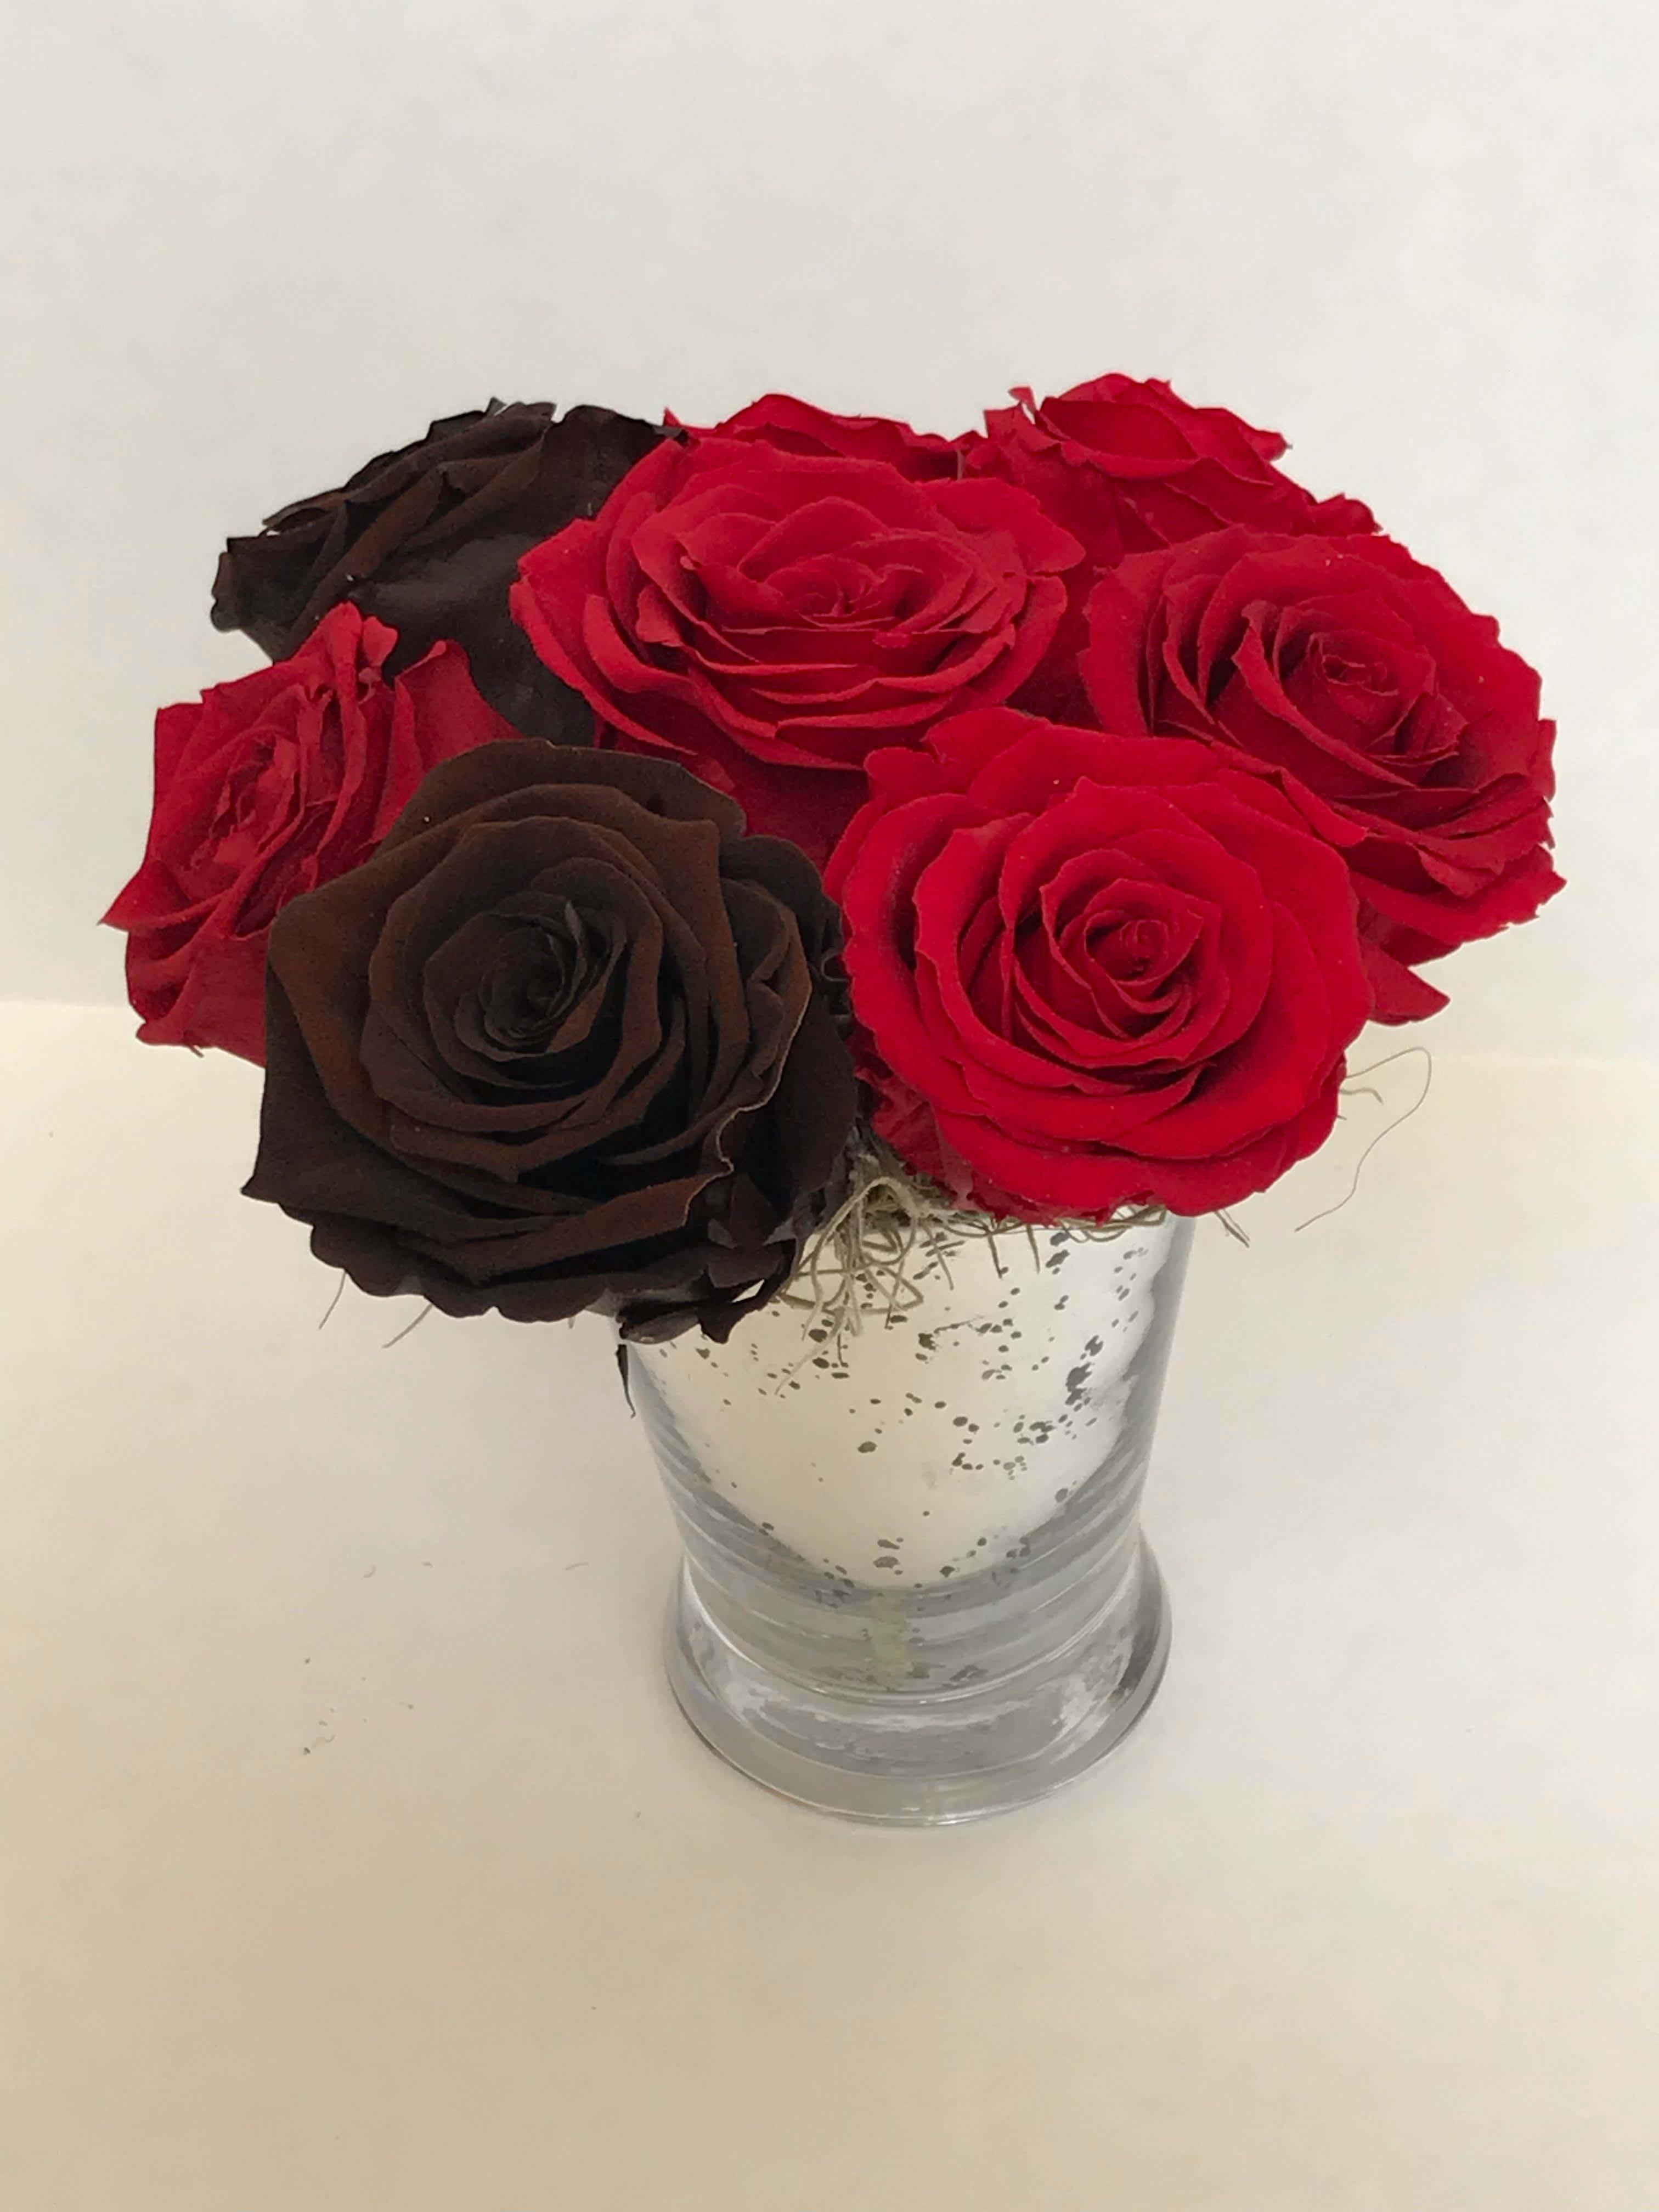 Black rose los angeles dating